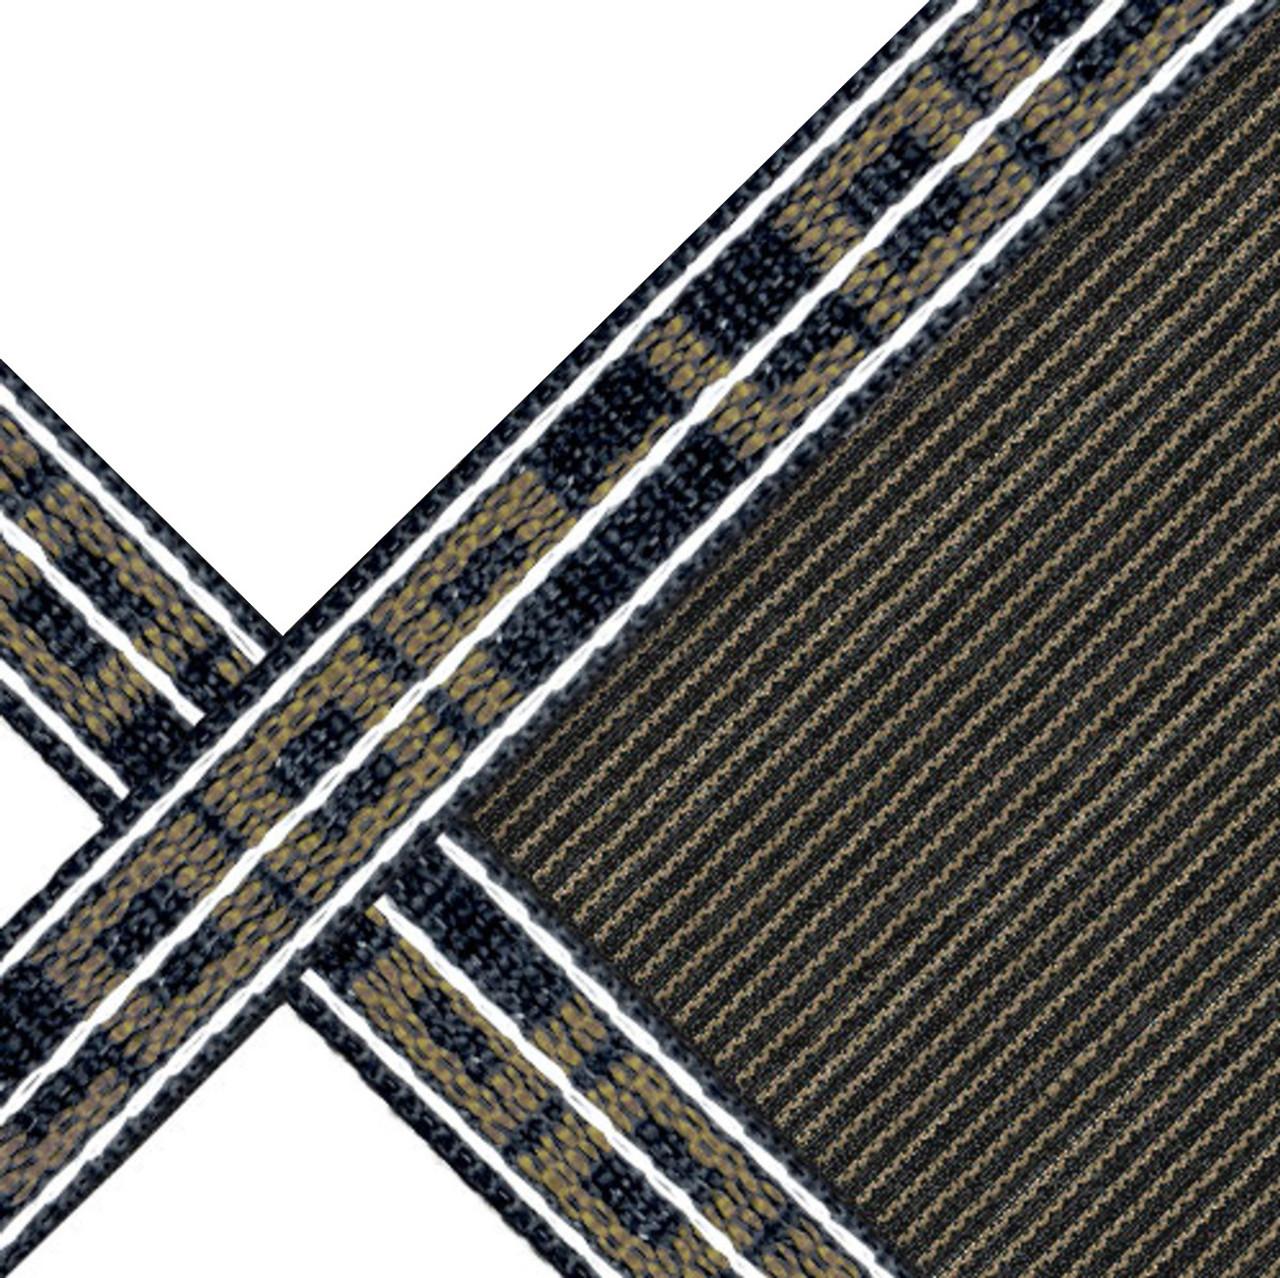 16 X 40 Rectangle Loop Loc Ii Tan Super Mesh In Ground